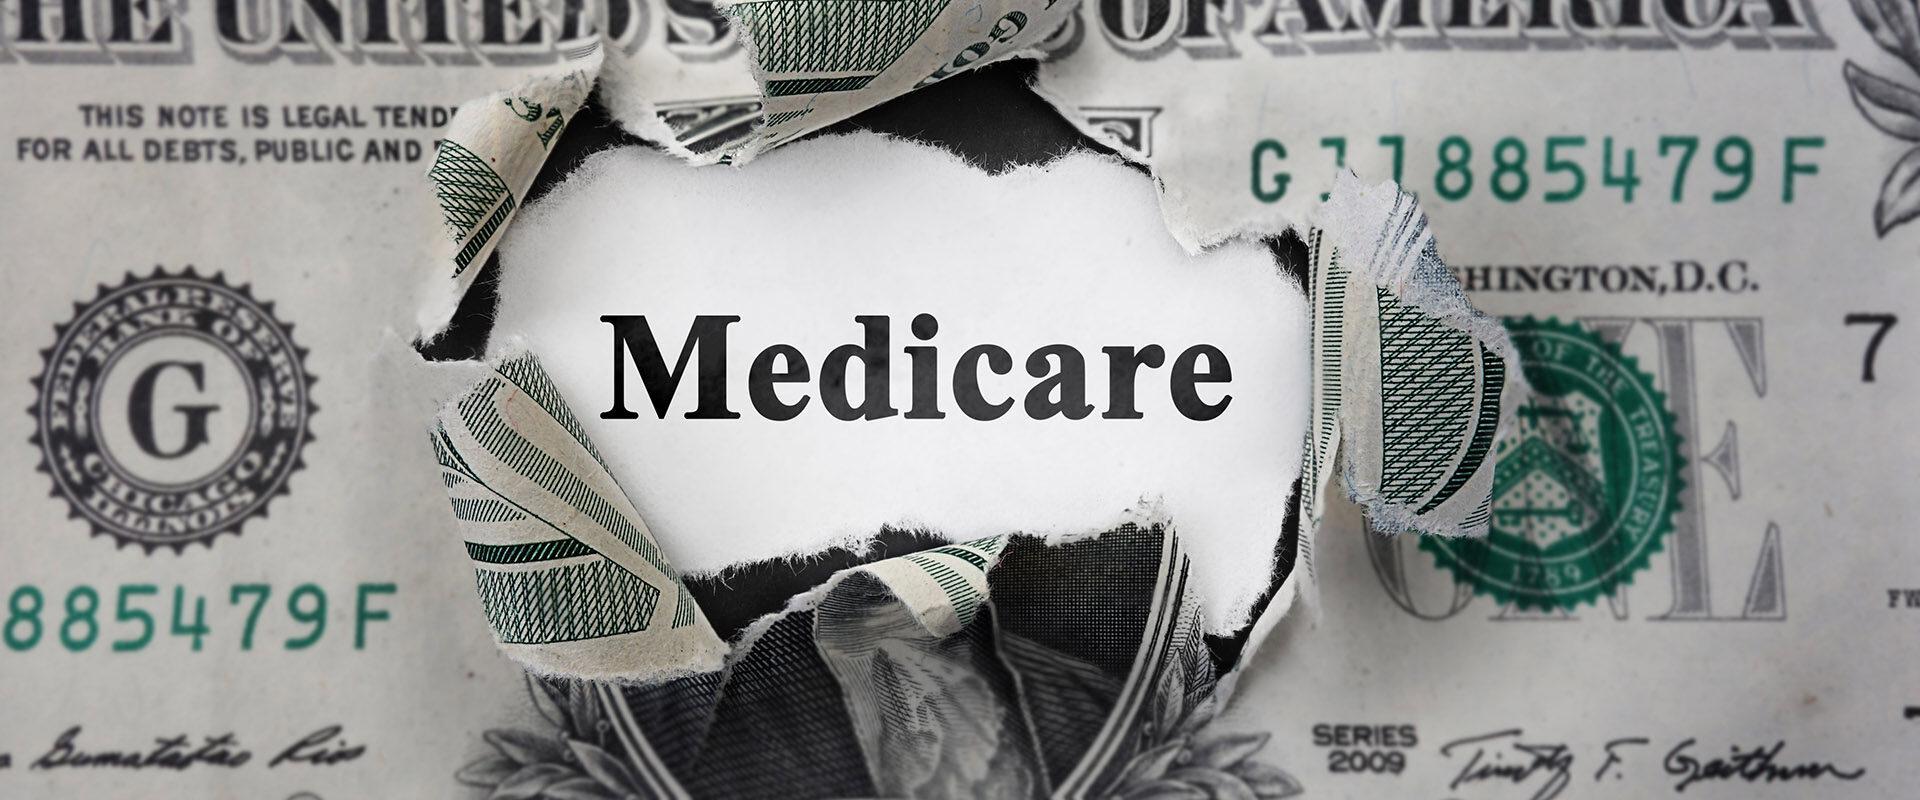 247 Members of Congress Urge House Leaders to Cancel Impending Medicare Reimbursement Cuts